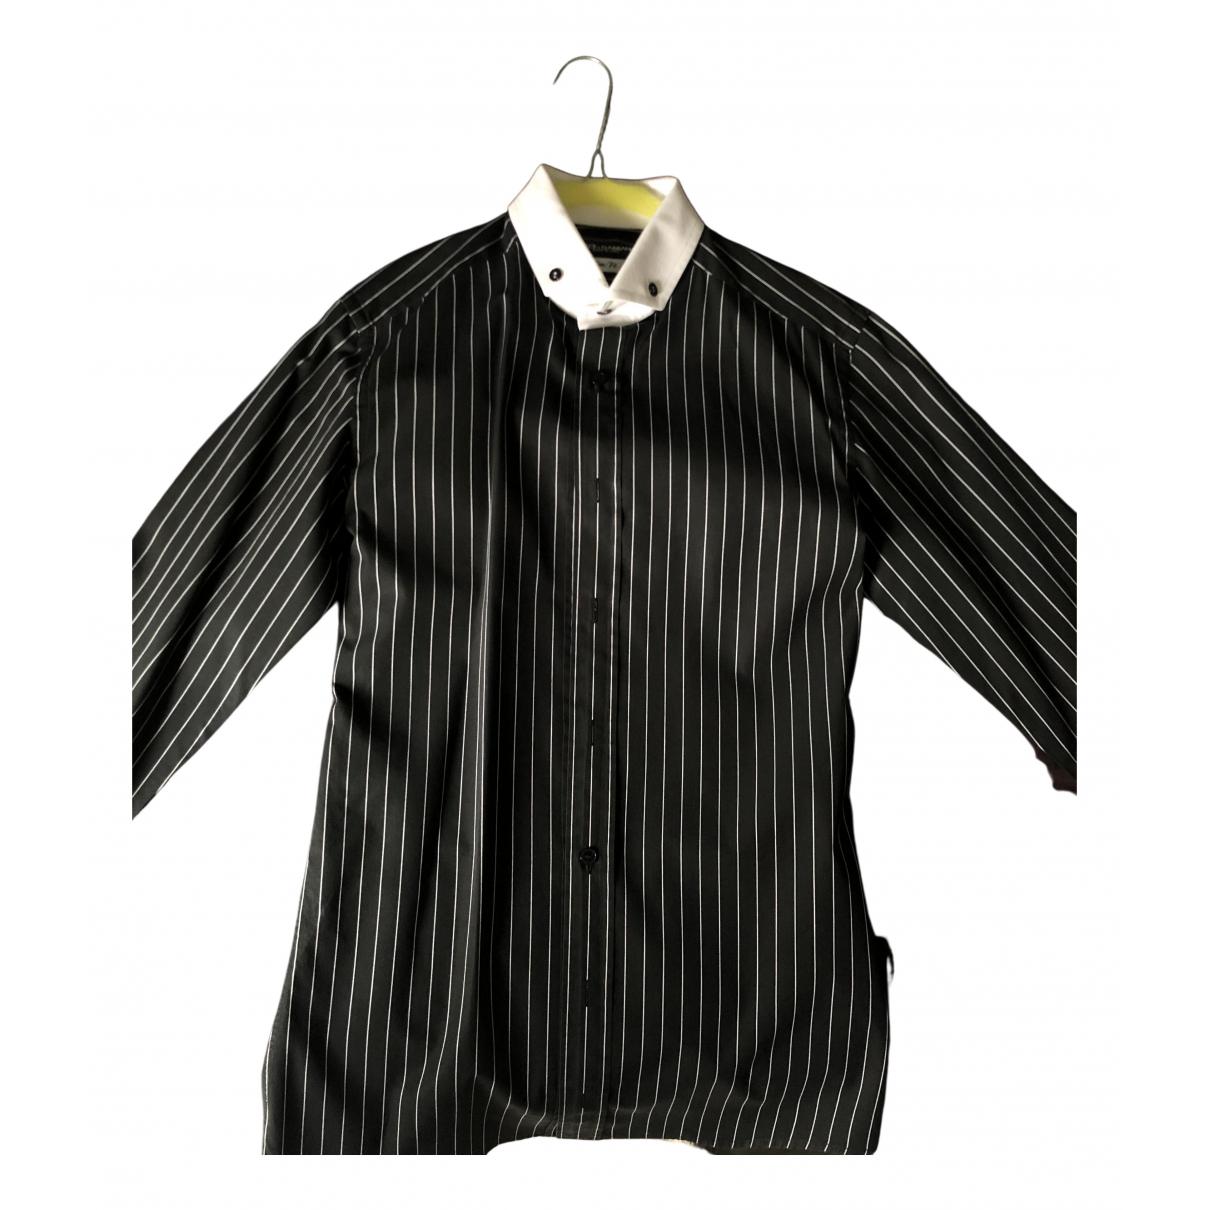 Dolce & Gabbana N Black Cotton Shirts for Men S International